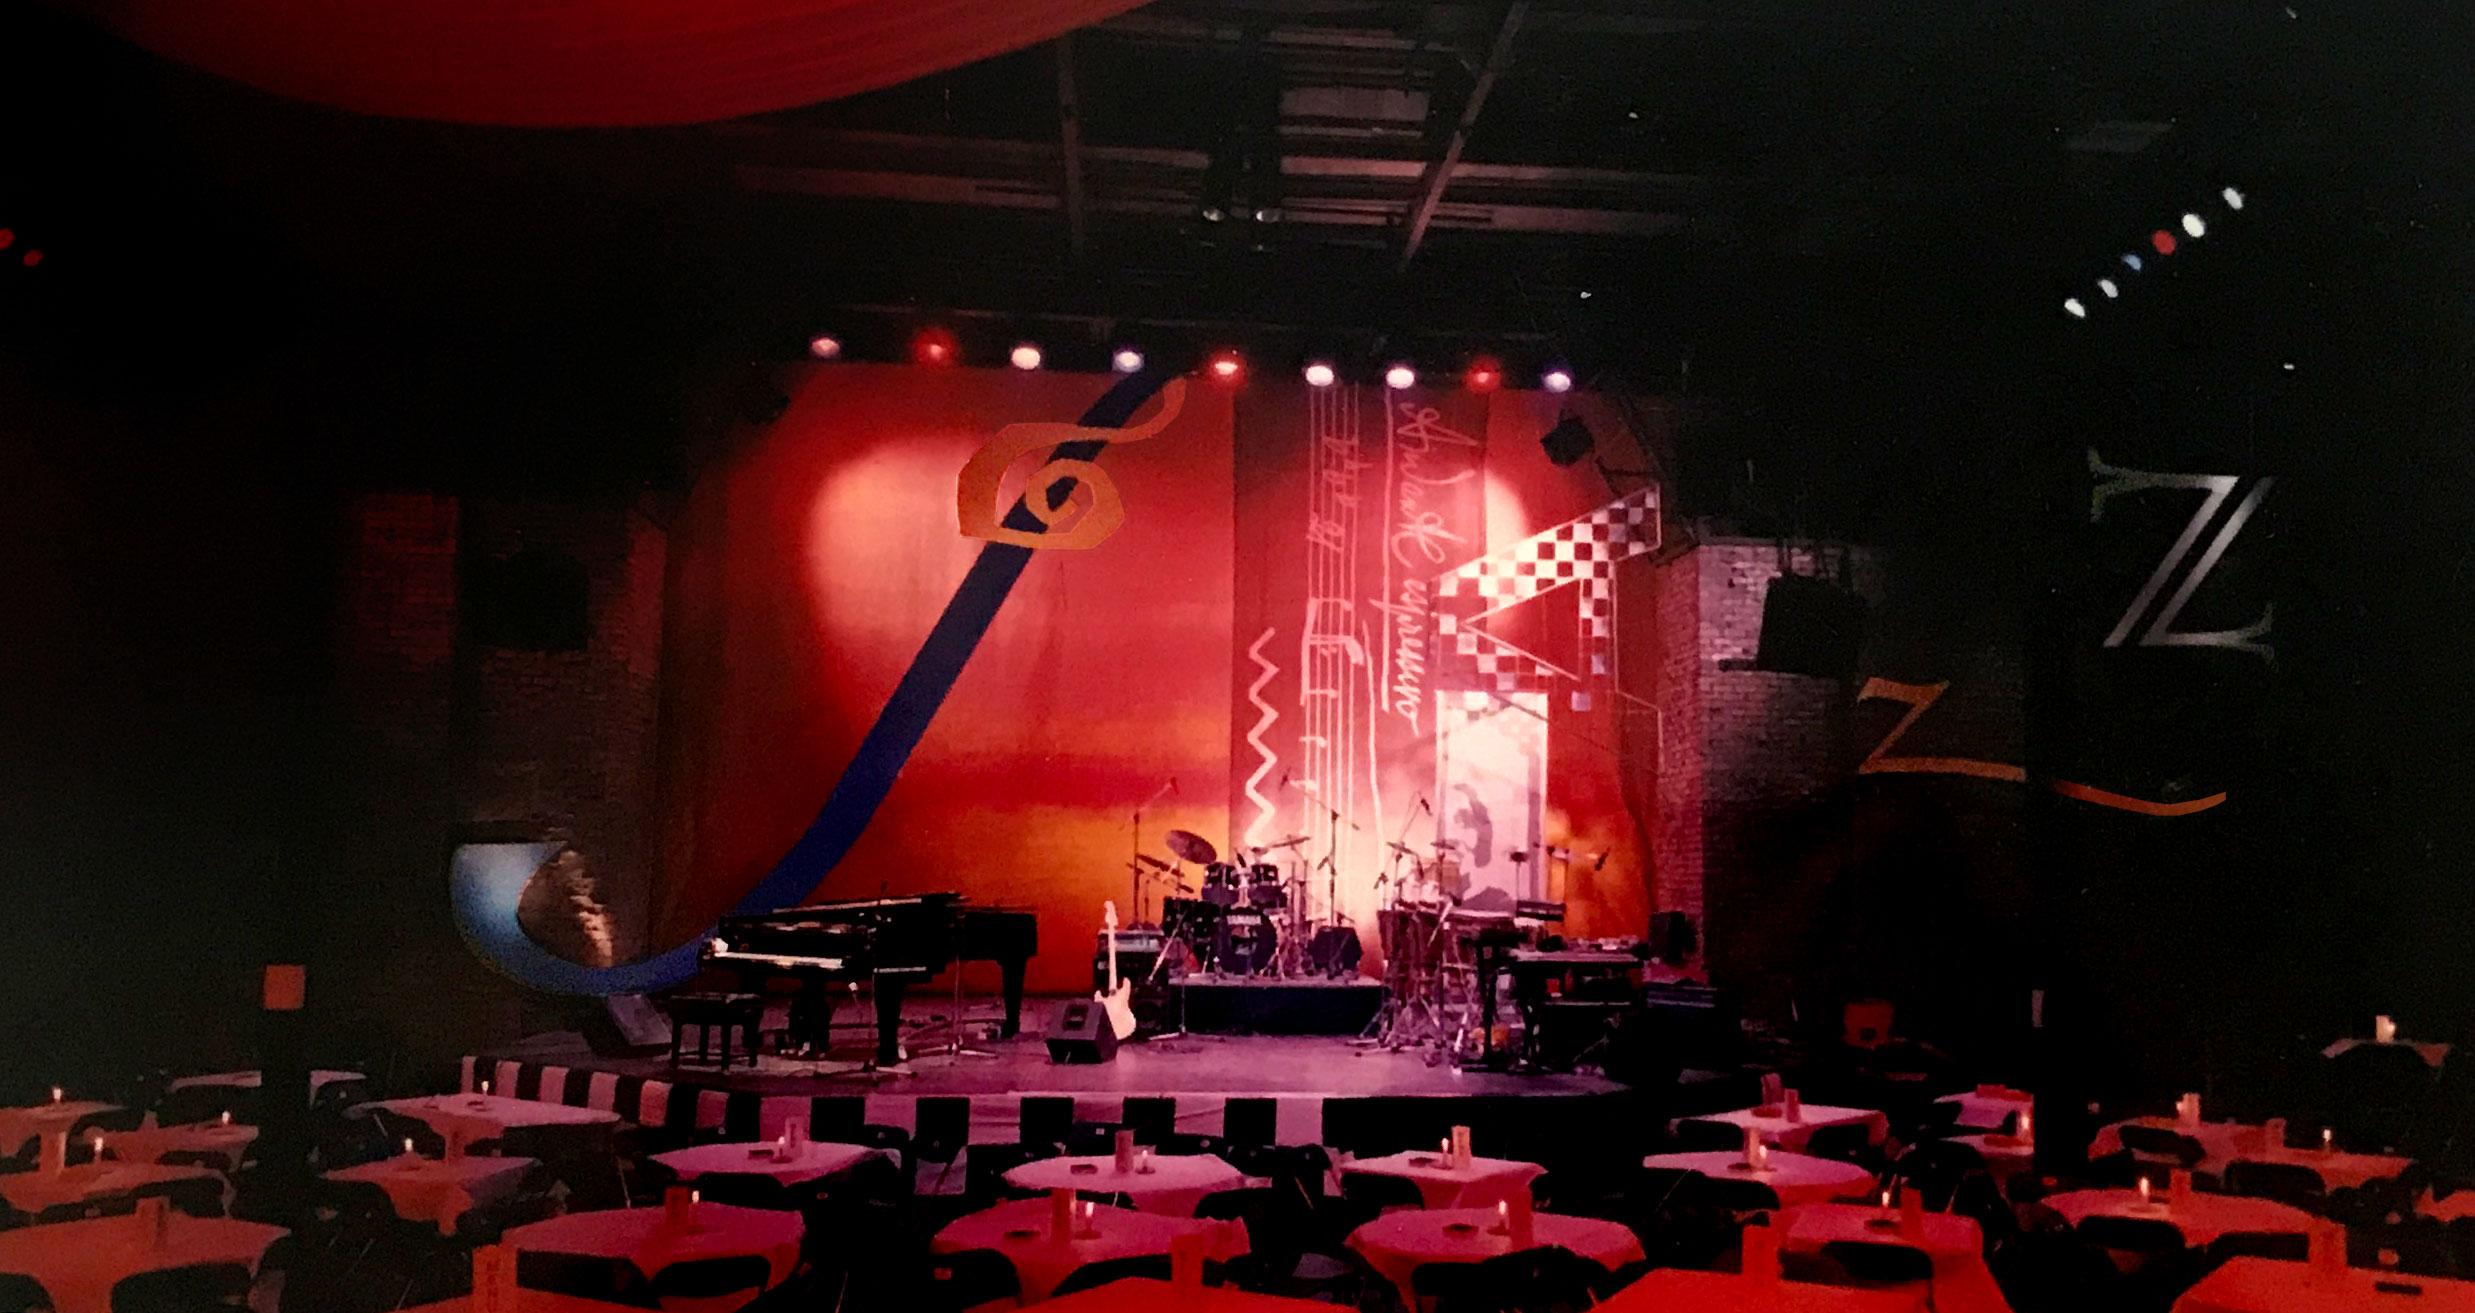 Late Night Jazz Club set design